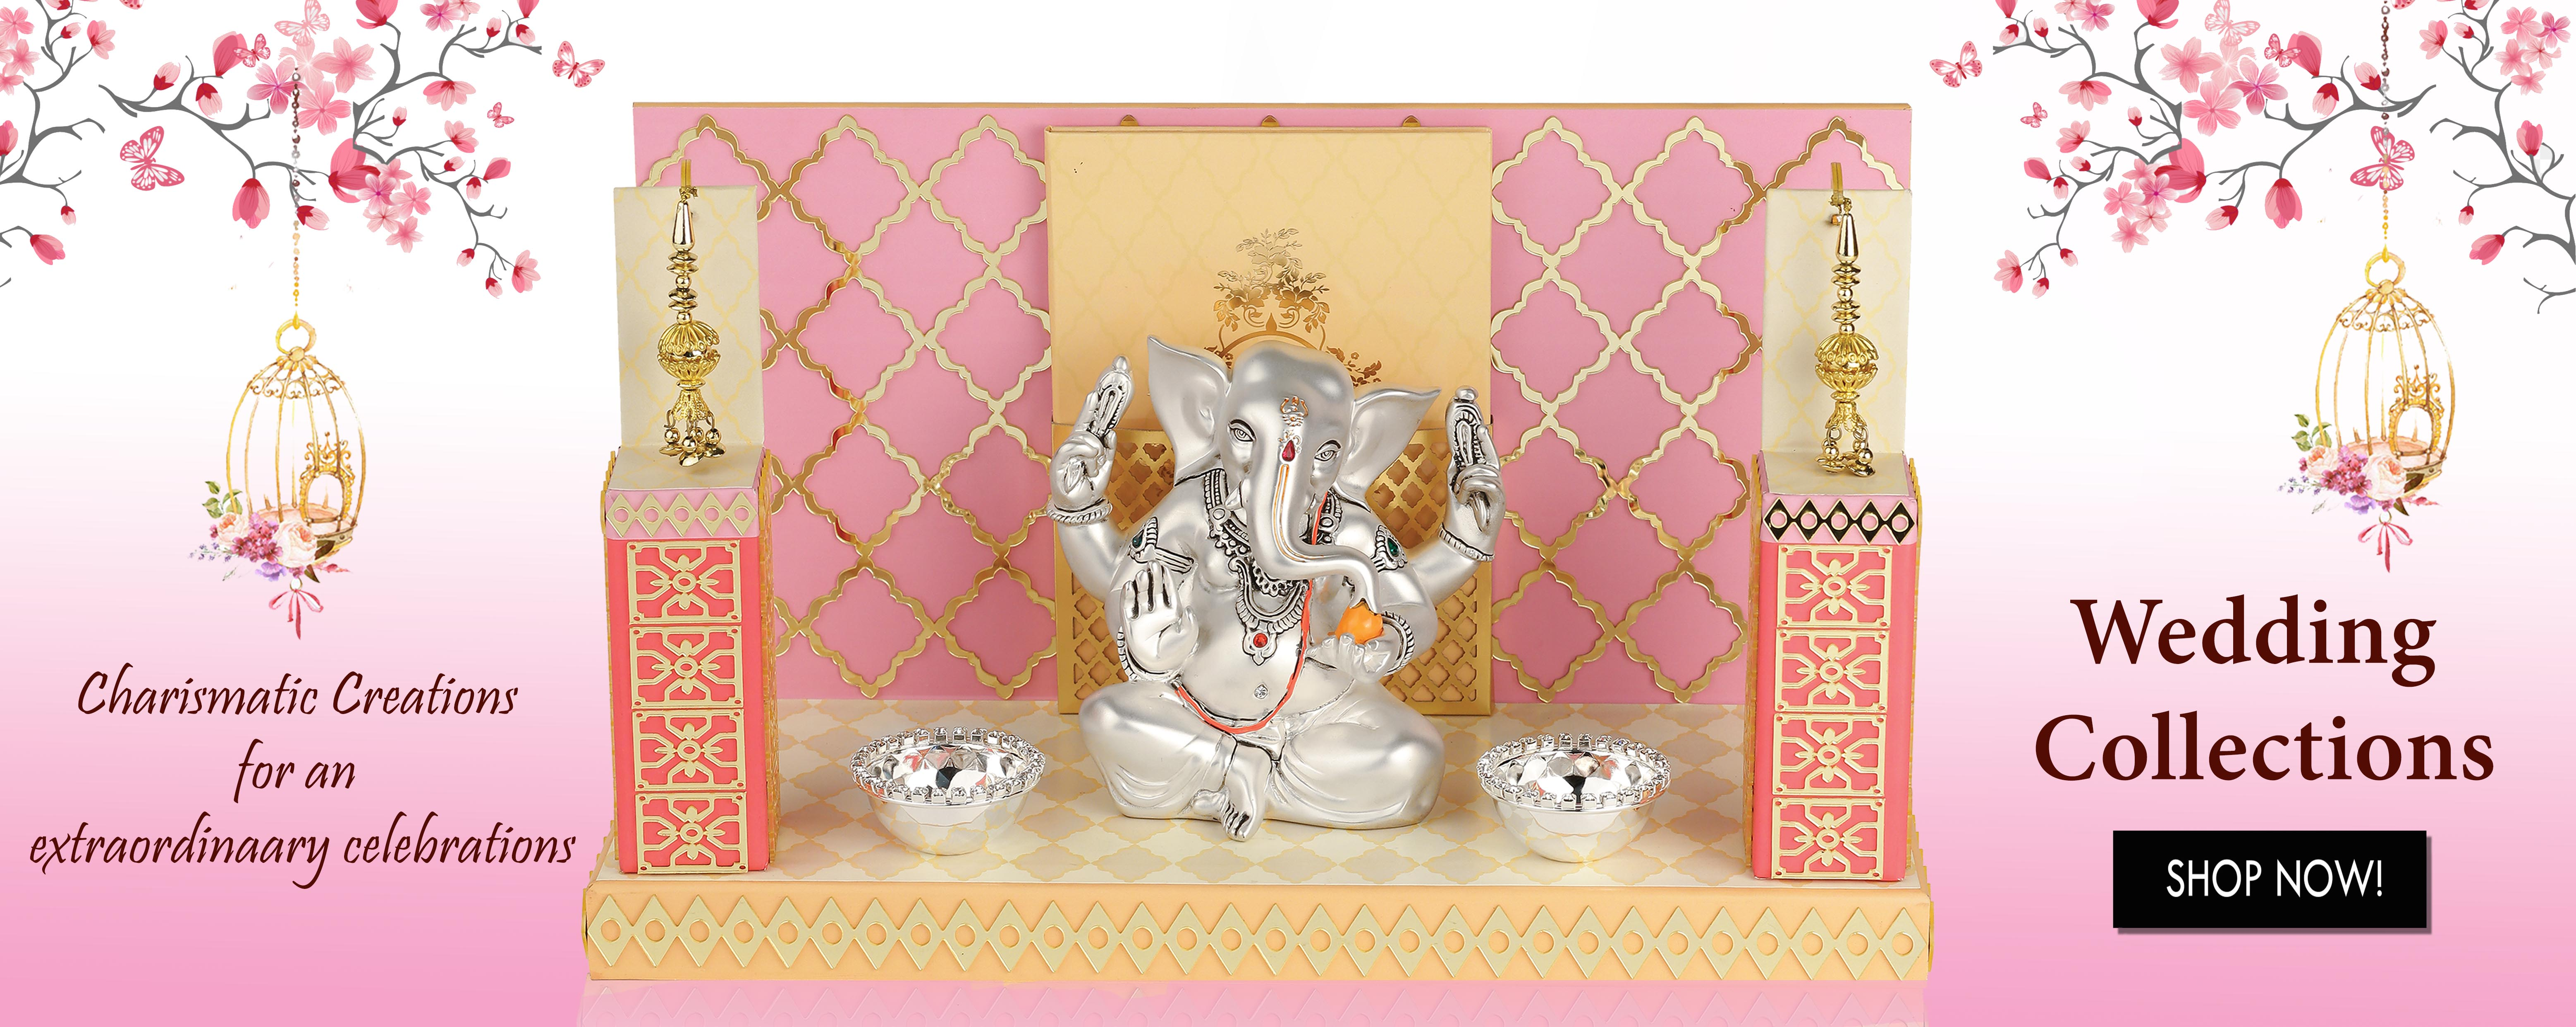 Wedding Gifts In Delhi India